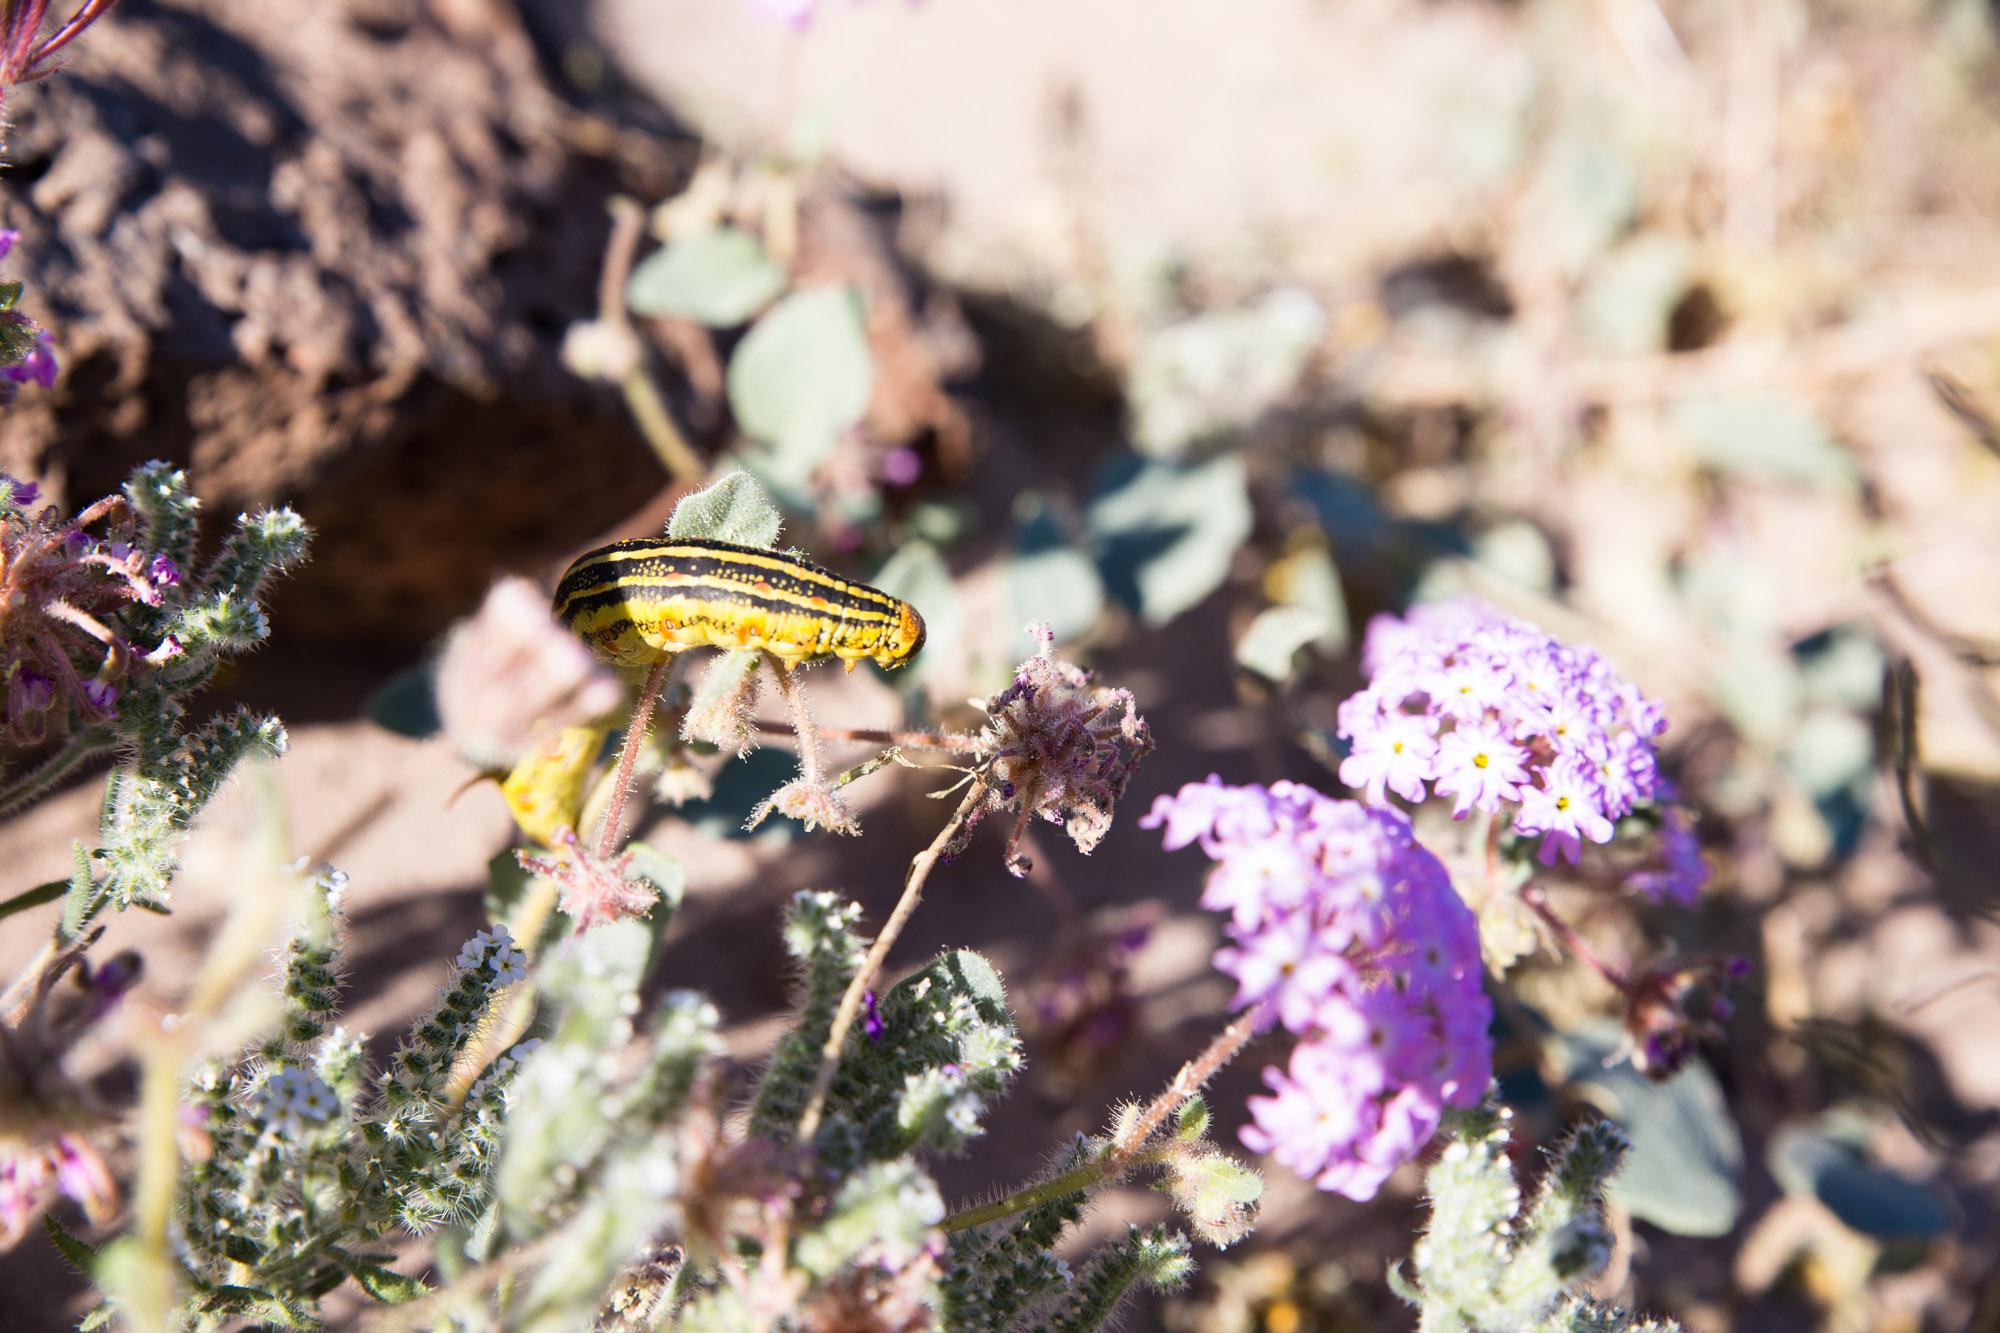 Desert Creatures Thriving on Wildflower 'Superbloom'